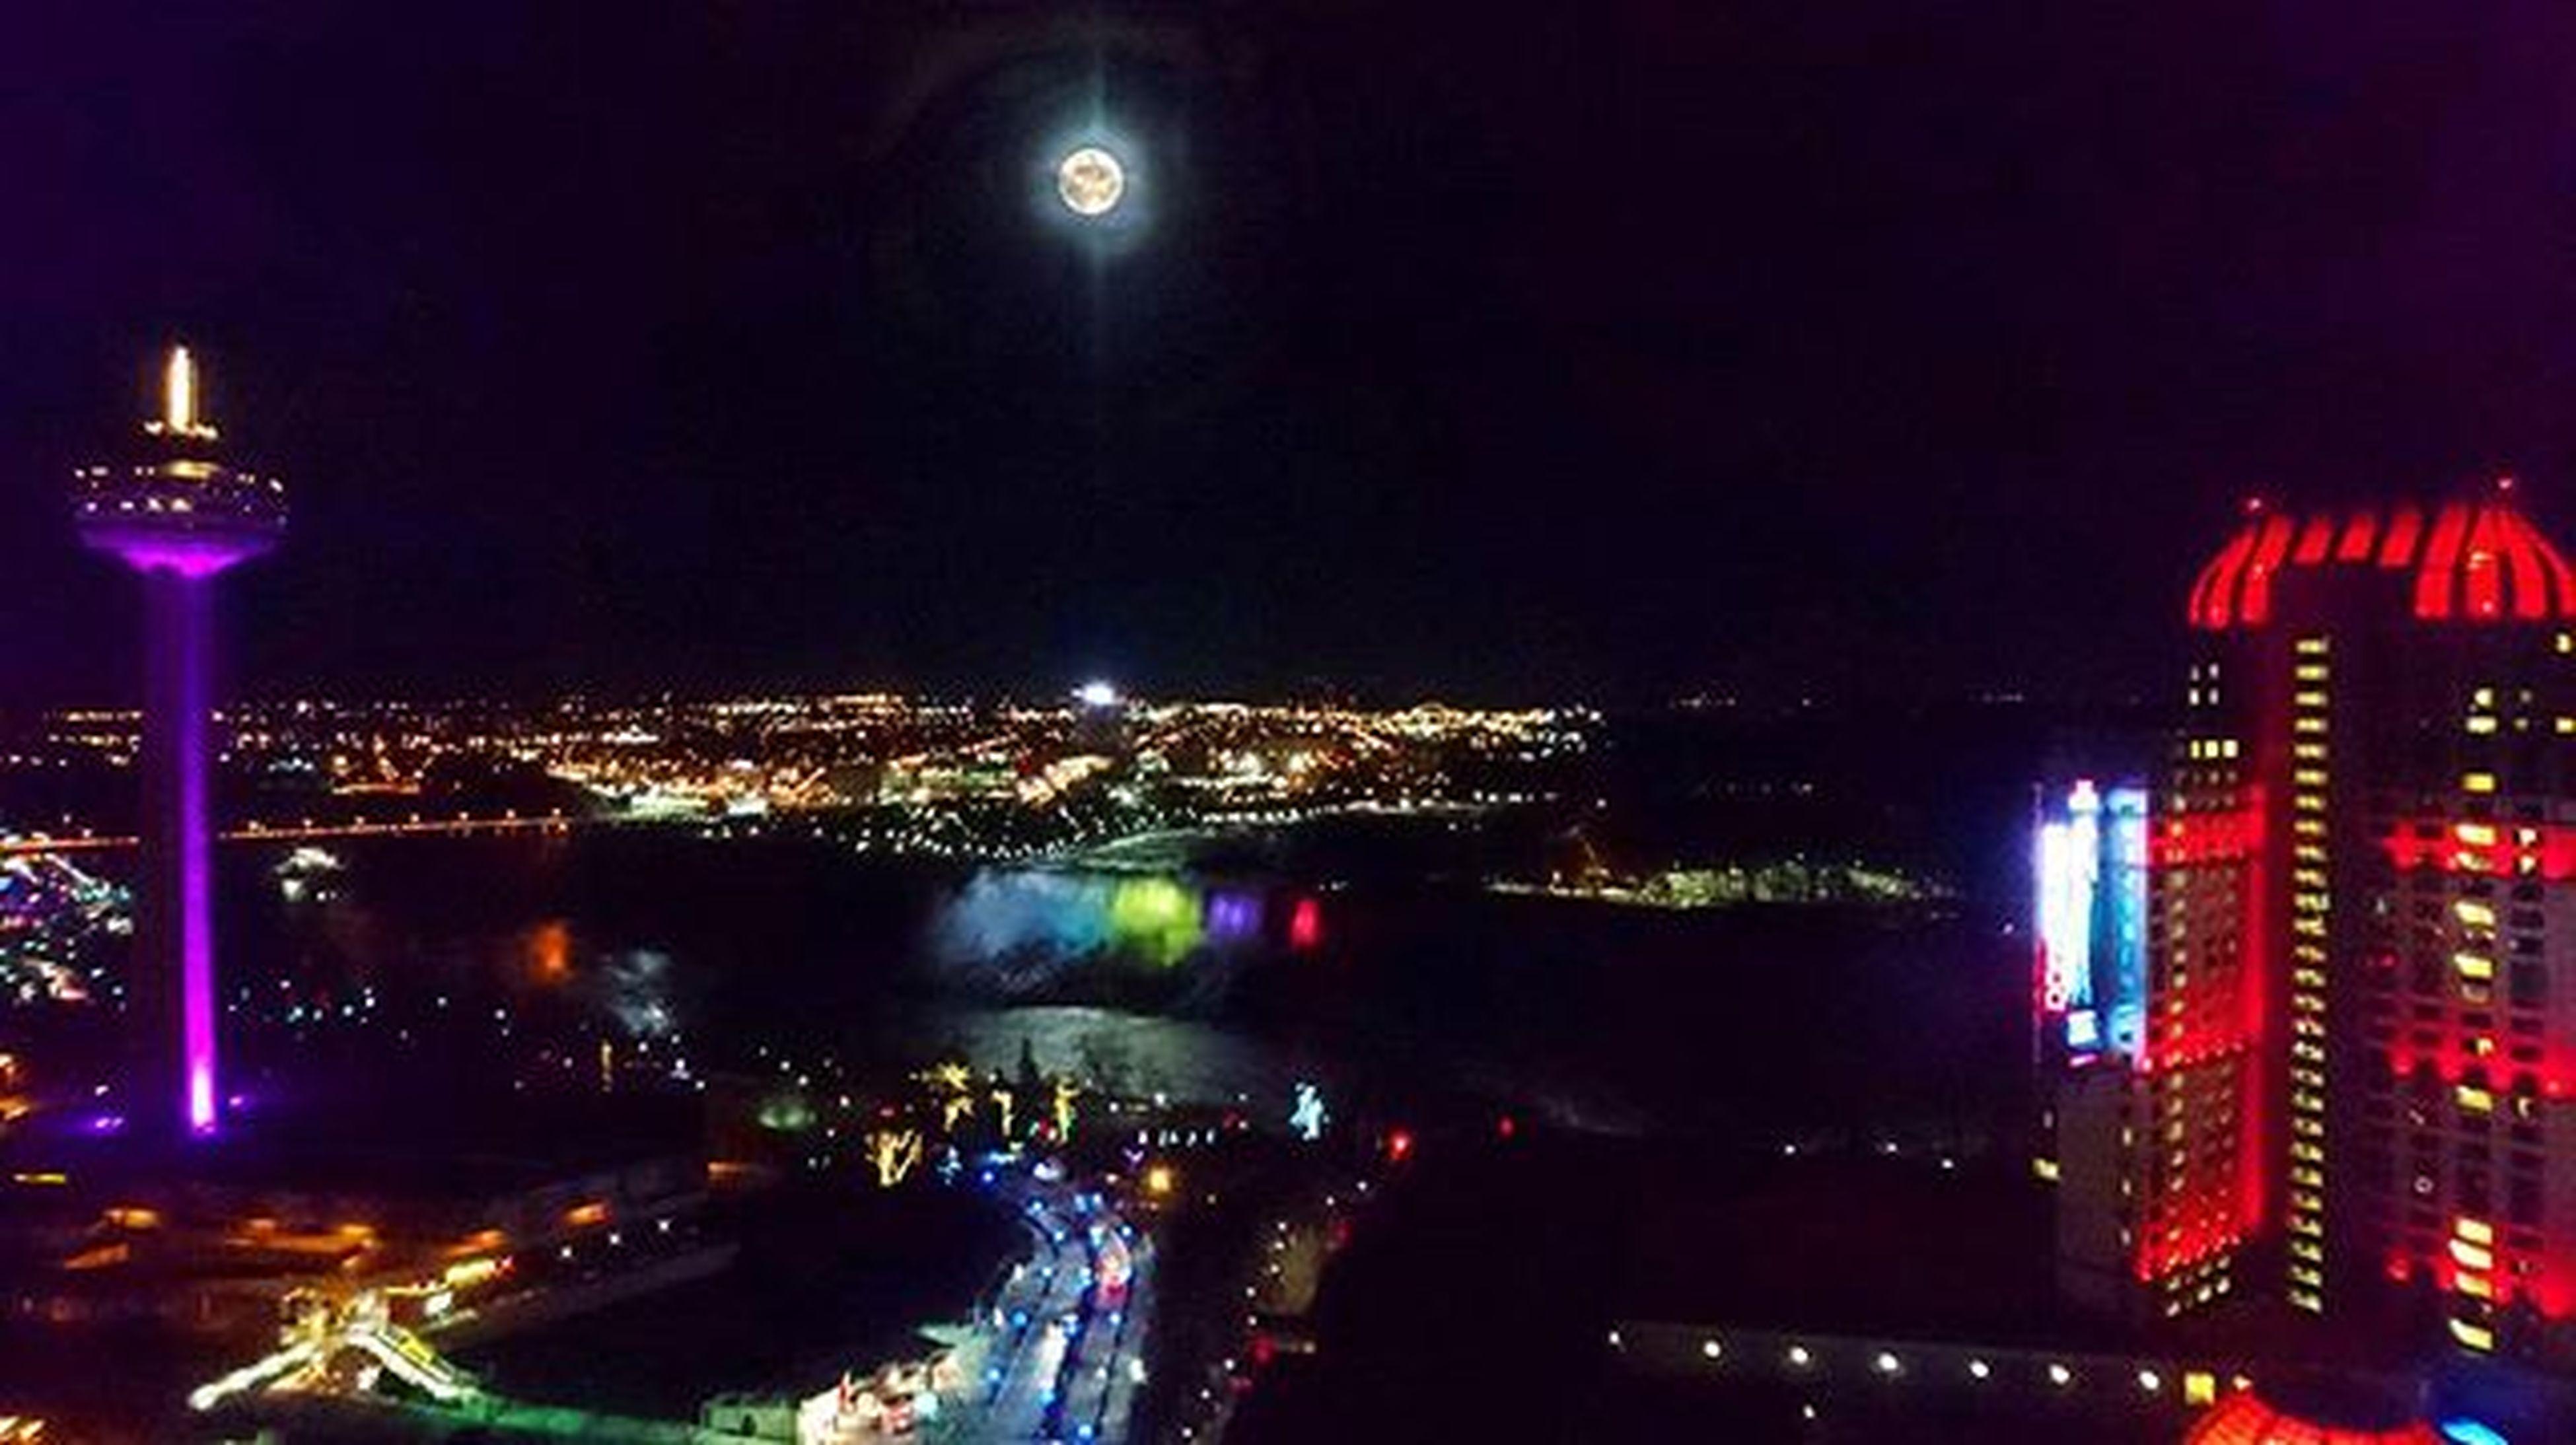 Niagara at night. FallsviewCasino Skylontower Niagarafalls Niagara Niagaraparks Colourful Fullmoon Casino Fun Niagaranightlife Niagaranights USA Niagaraescarpment HorseshoeFalls Nikonphotographers Falls Nikonphotography D7000 Rrhurstphotography Nofilter Latowphotographersguild